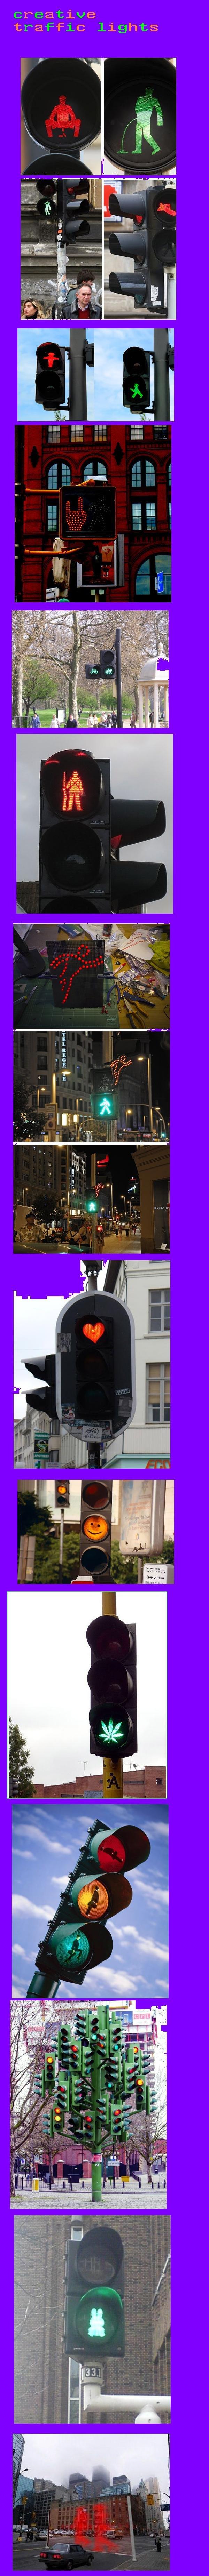 Creative traffic lights. traffic jams. Mi iii ML 4111, II I traffic light traffic jam win